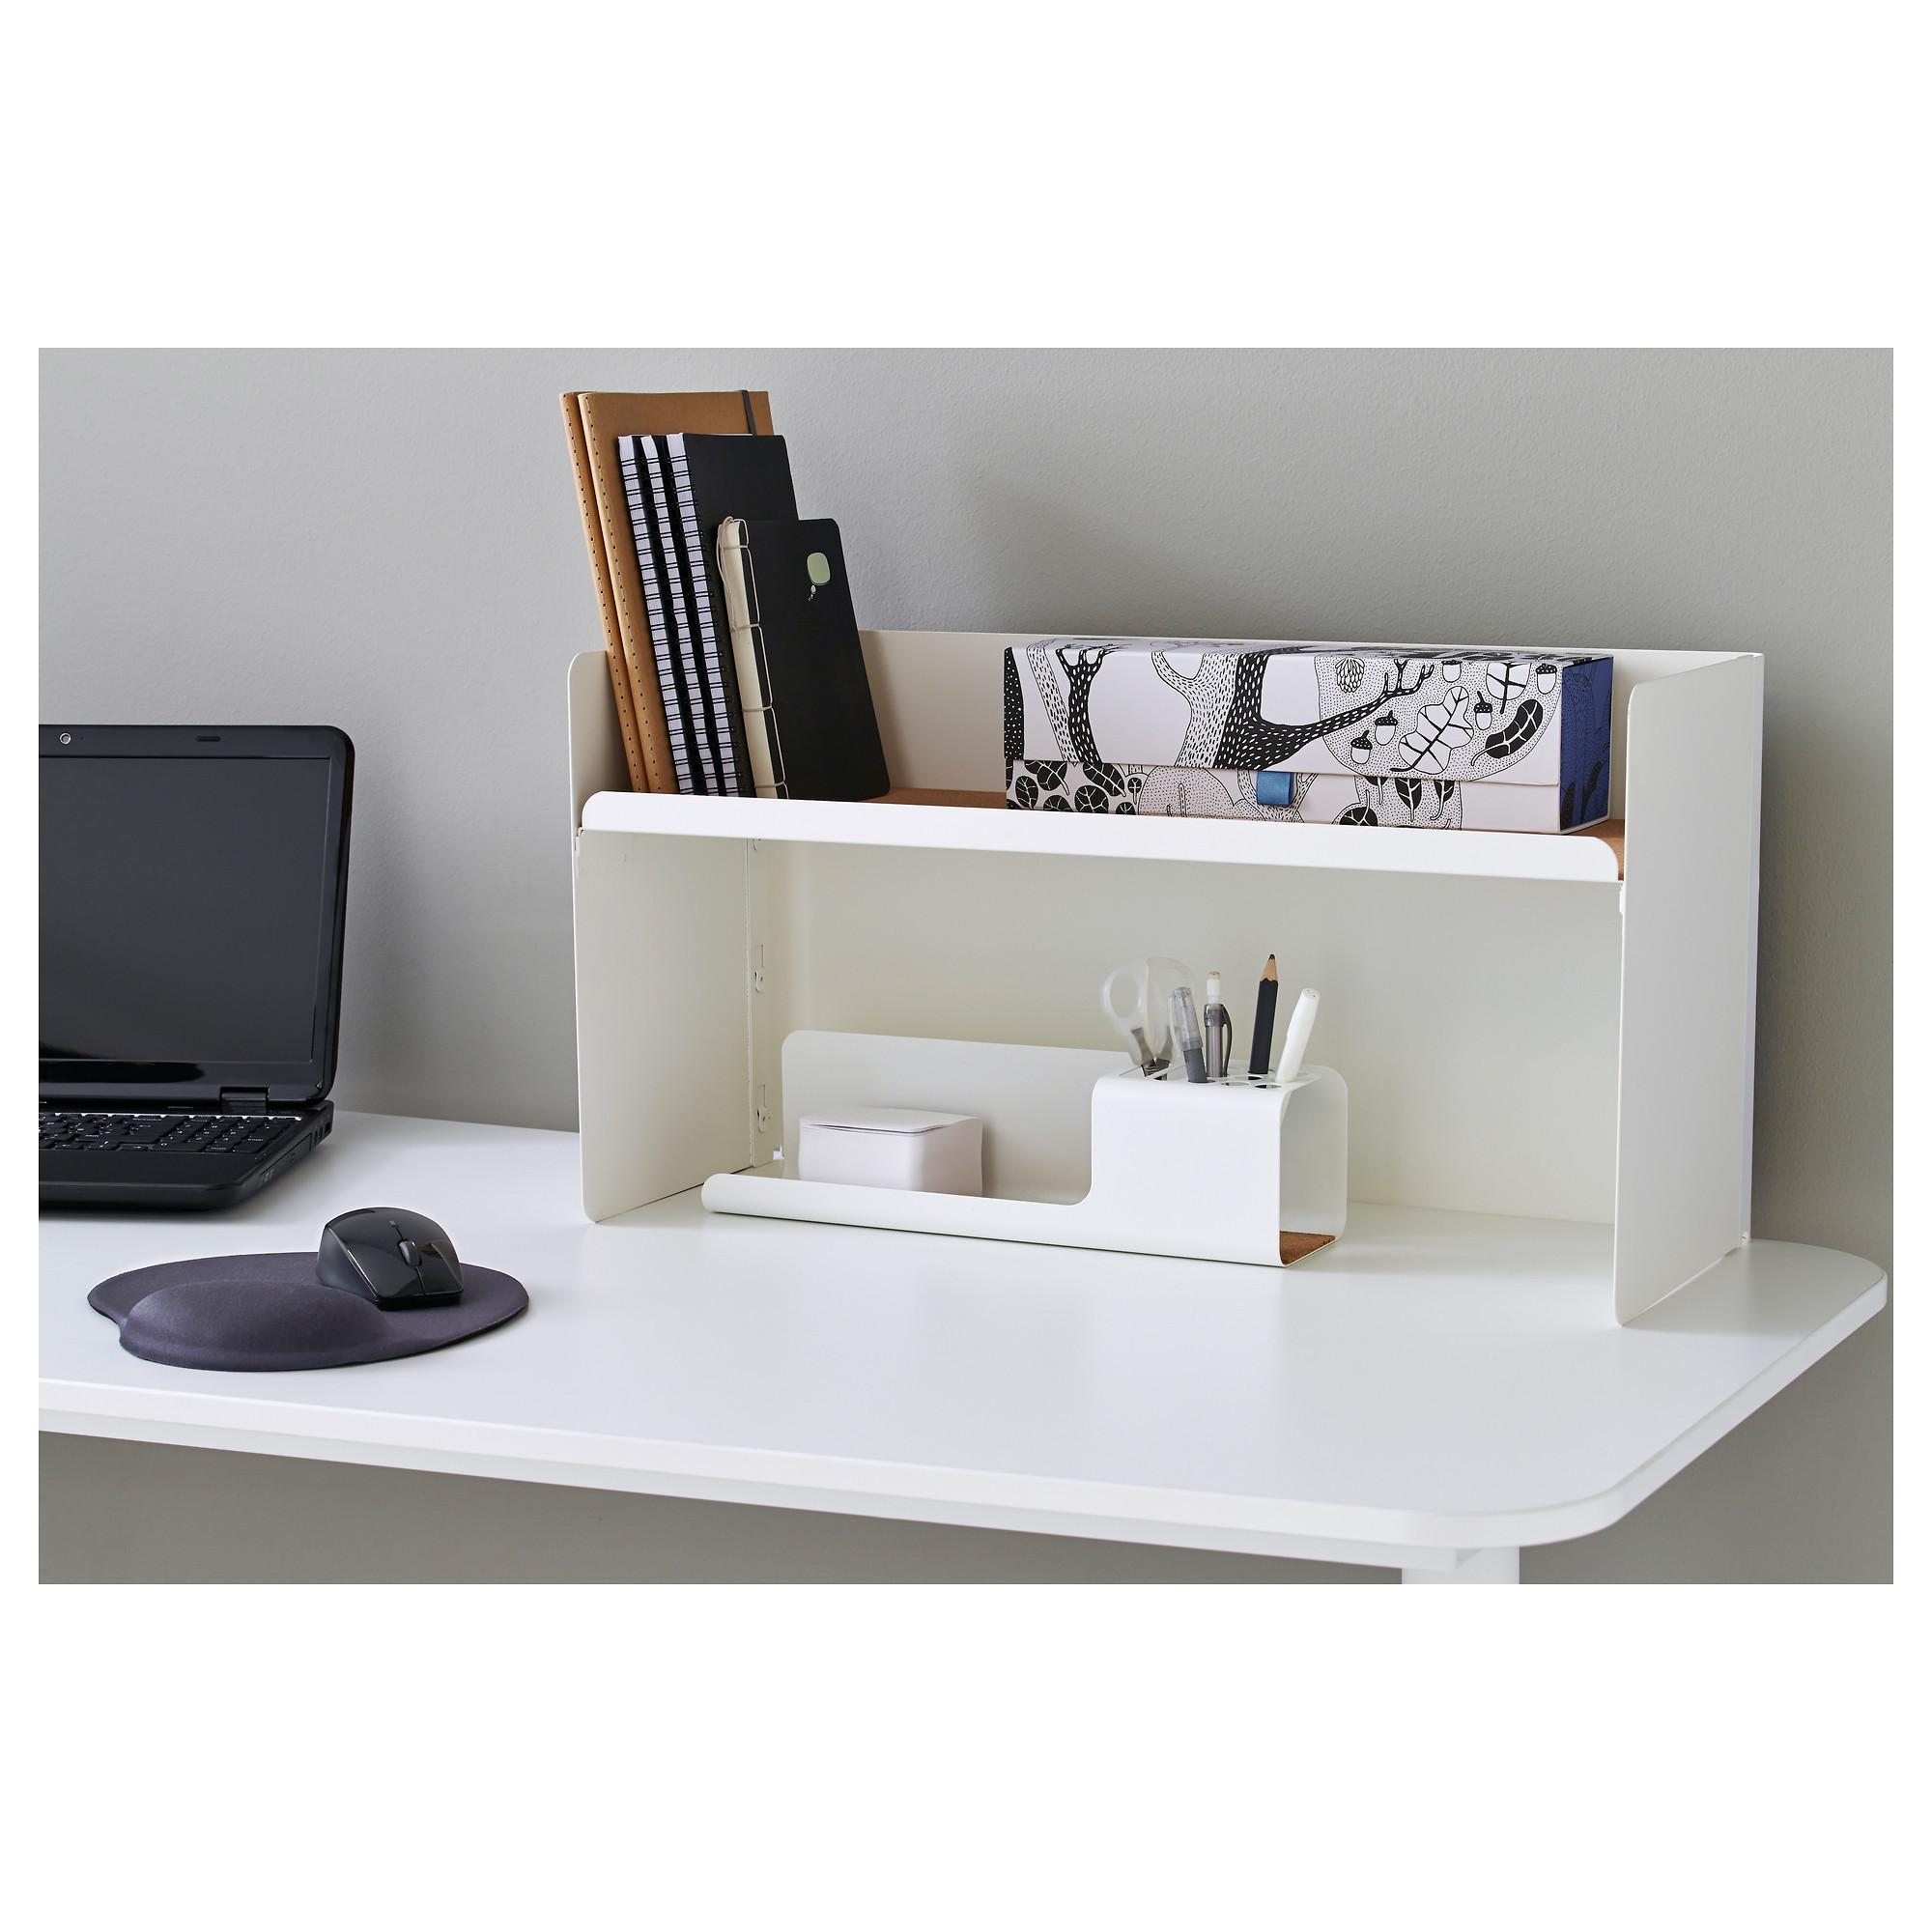 Desk top shelf BEKANT White